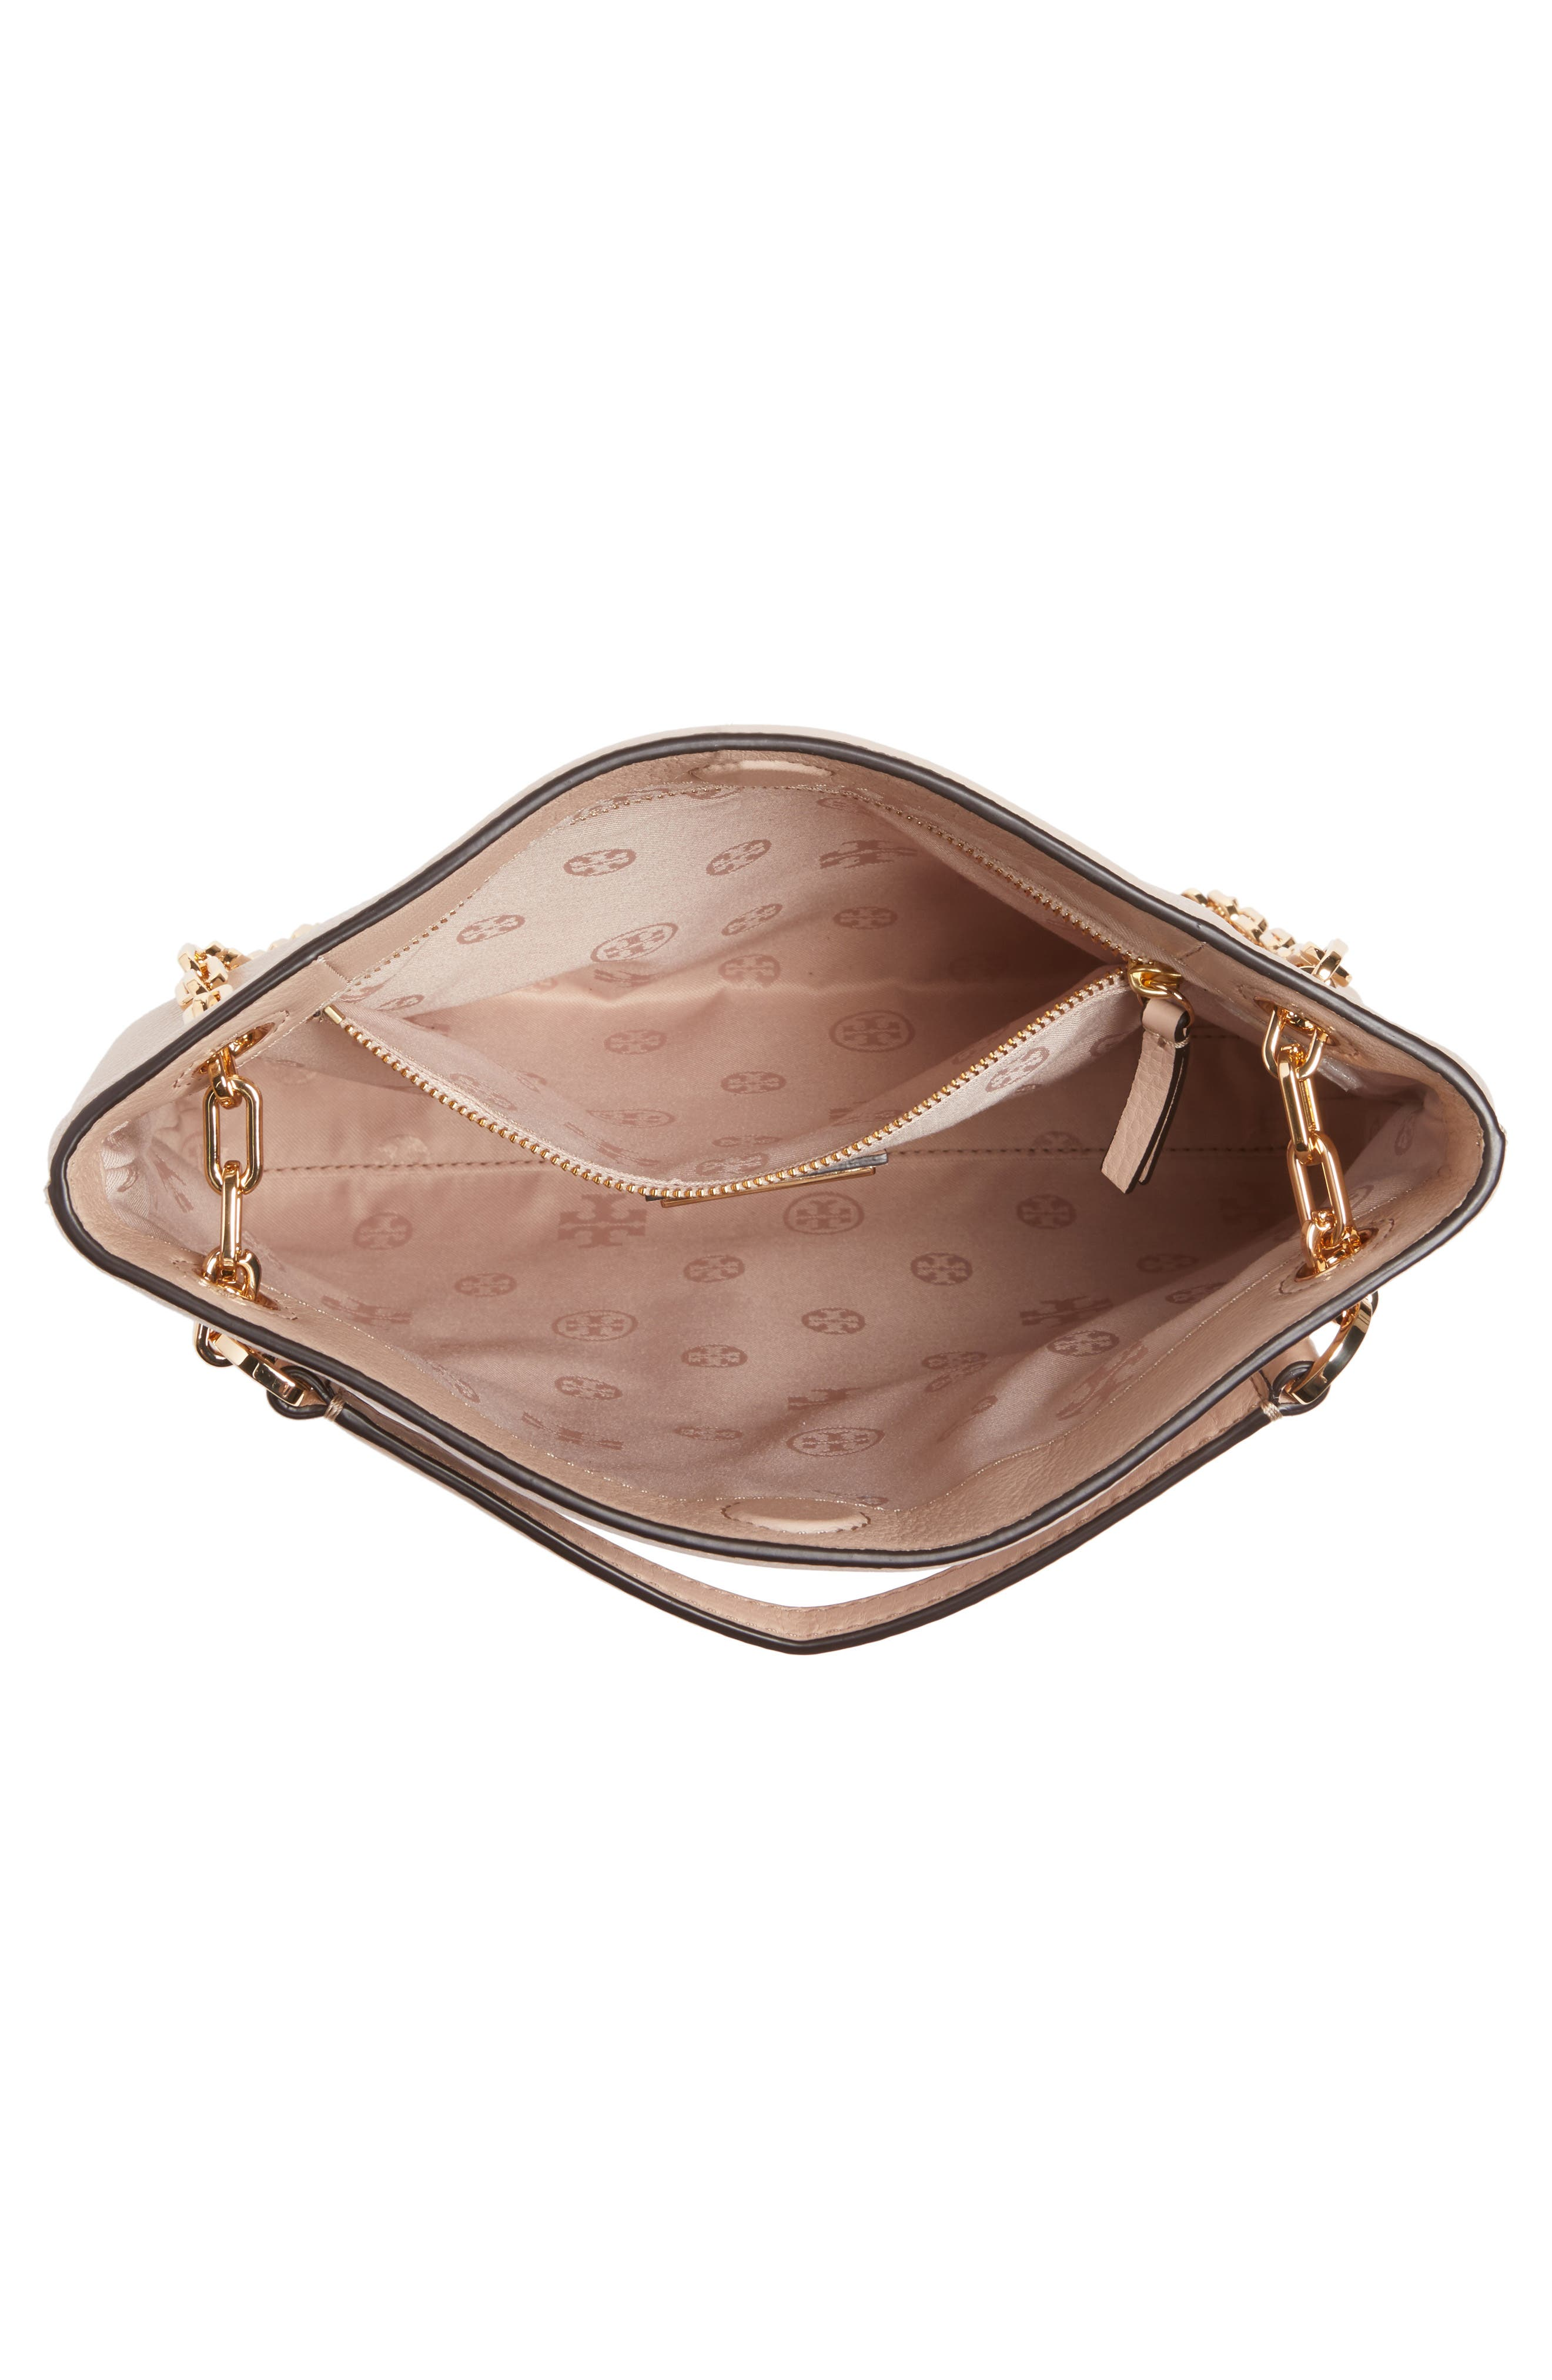 Frida Swingpack Leather Crossbody Bag,                             Alternate thumbnail 4, color,                             Light Oak